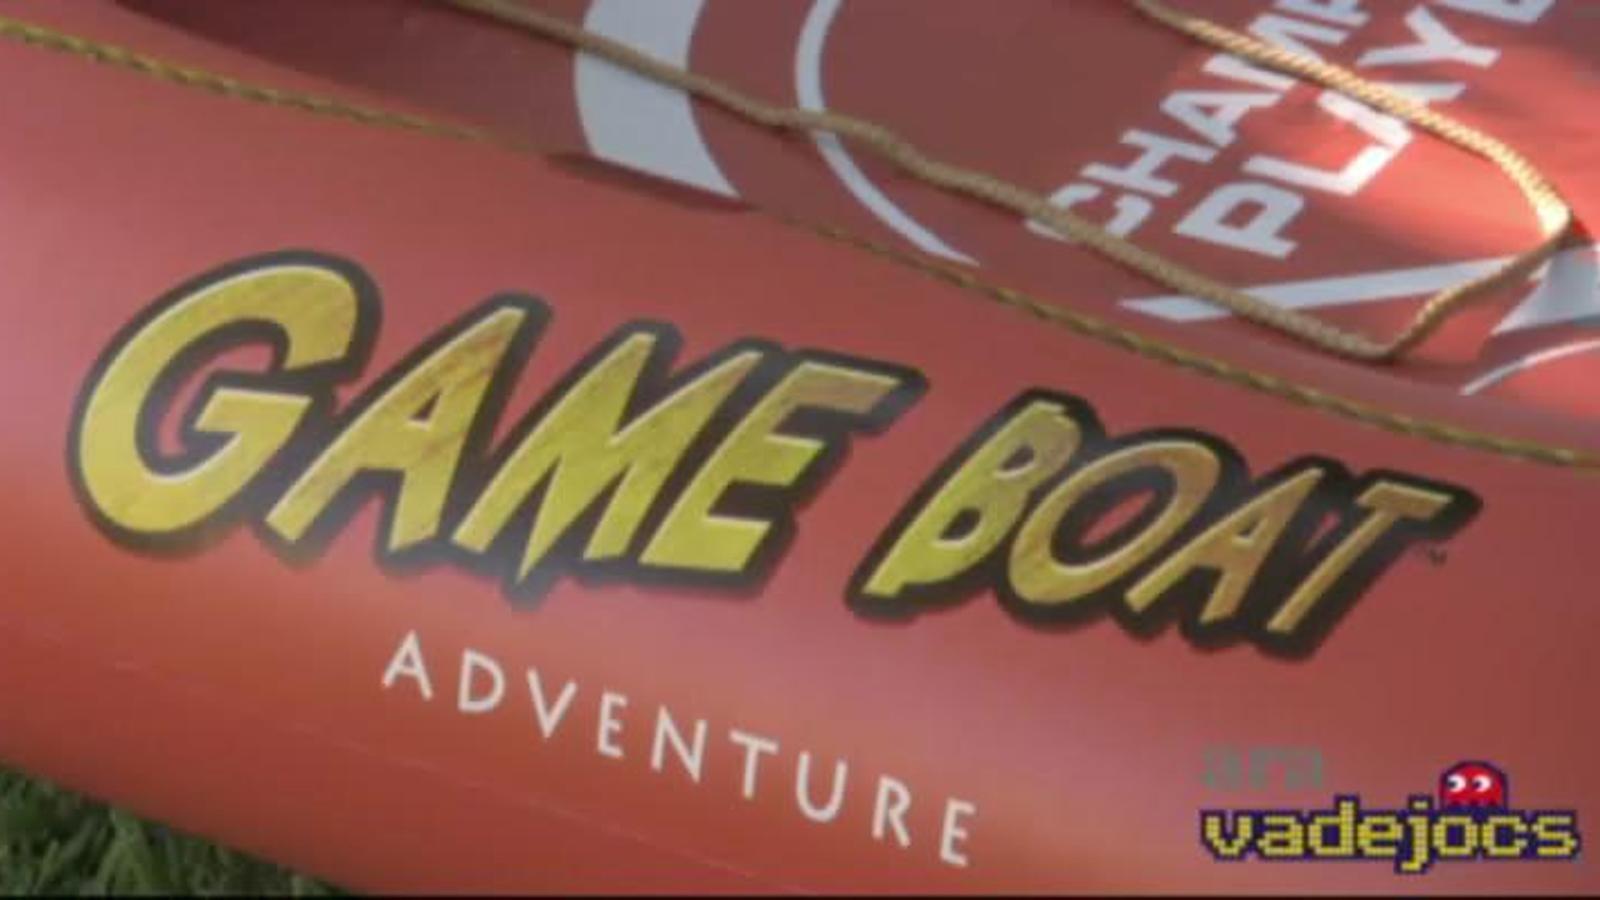 Unboxing de la Game Boat per a Xbox 360 Kinect.